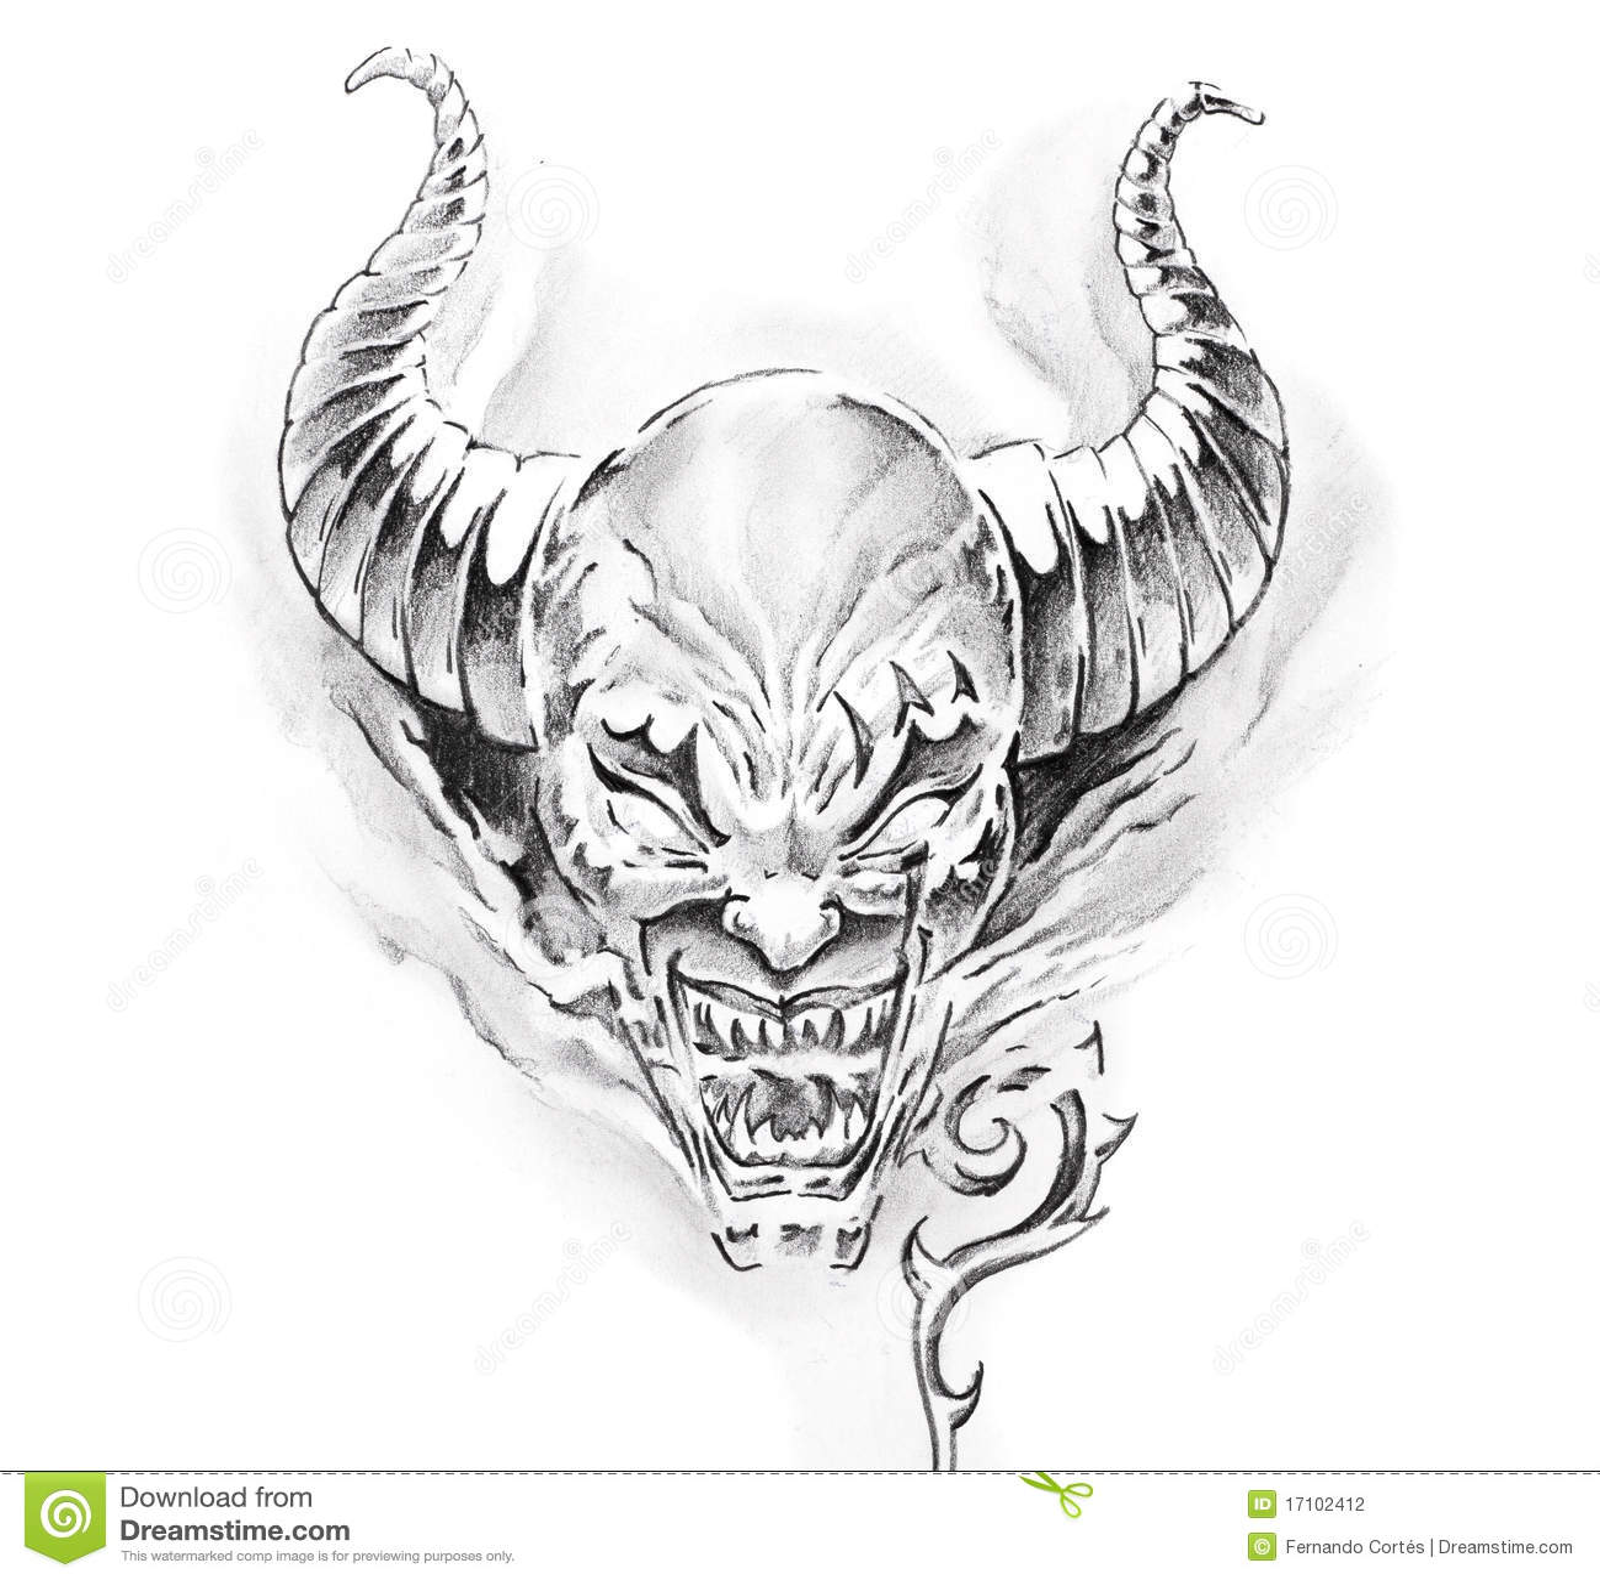 tattoo art sketch of a devil stock photography image 17102412. Black Bedroom Furniture Sets. Home Design Ideas